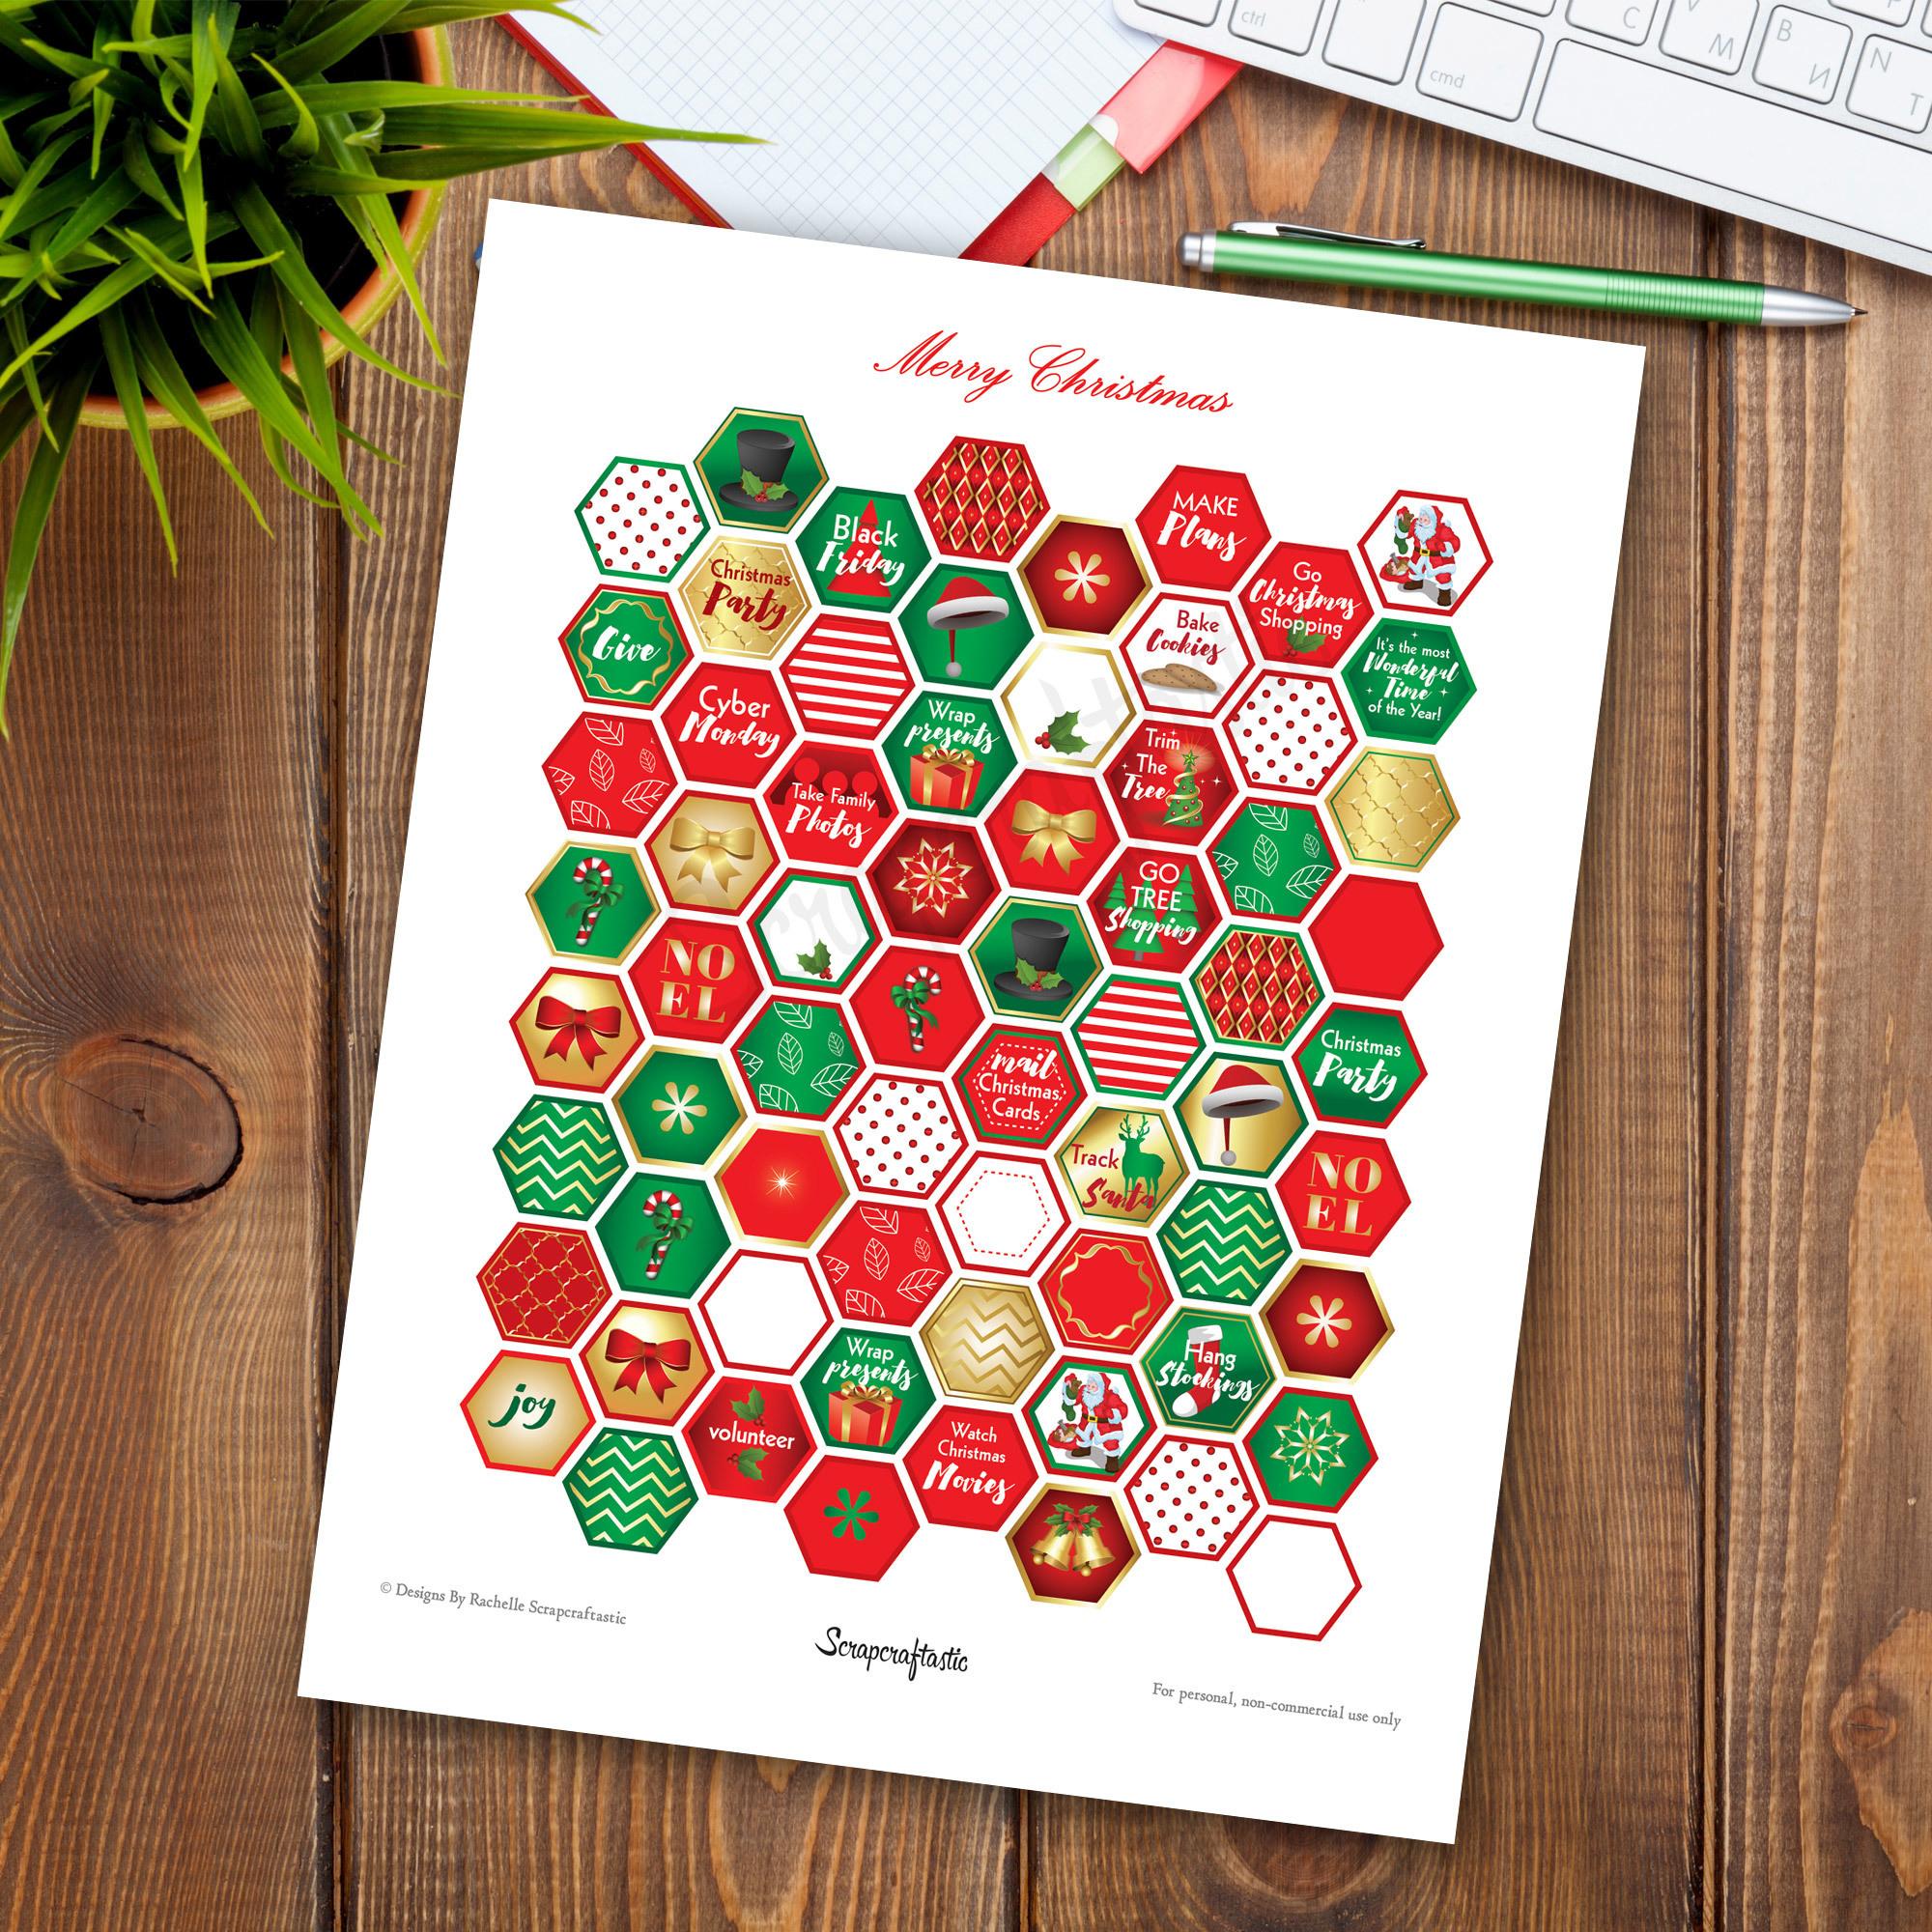 Christmas Traditions Hexagon Printable Planner Stickers for Happy Planner, Erin Condren, Filofax, Carpe Diem, Kikki-K 01013